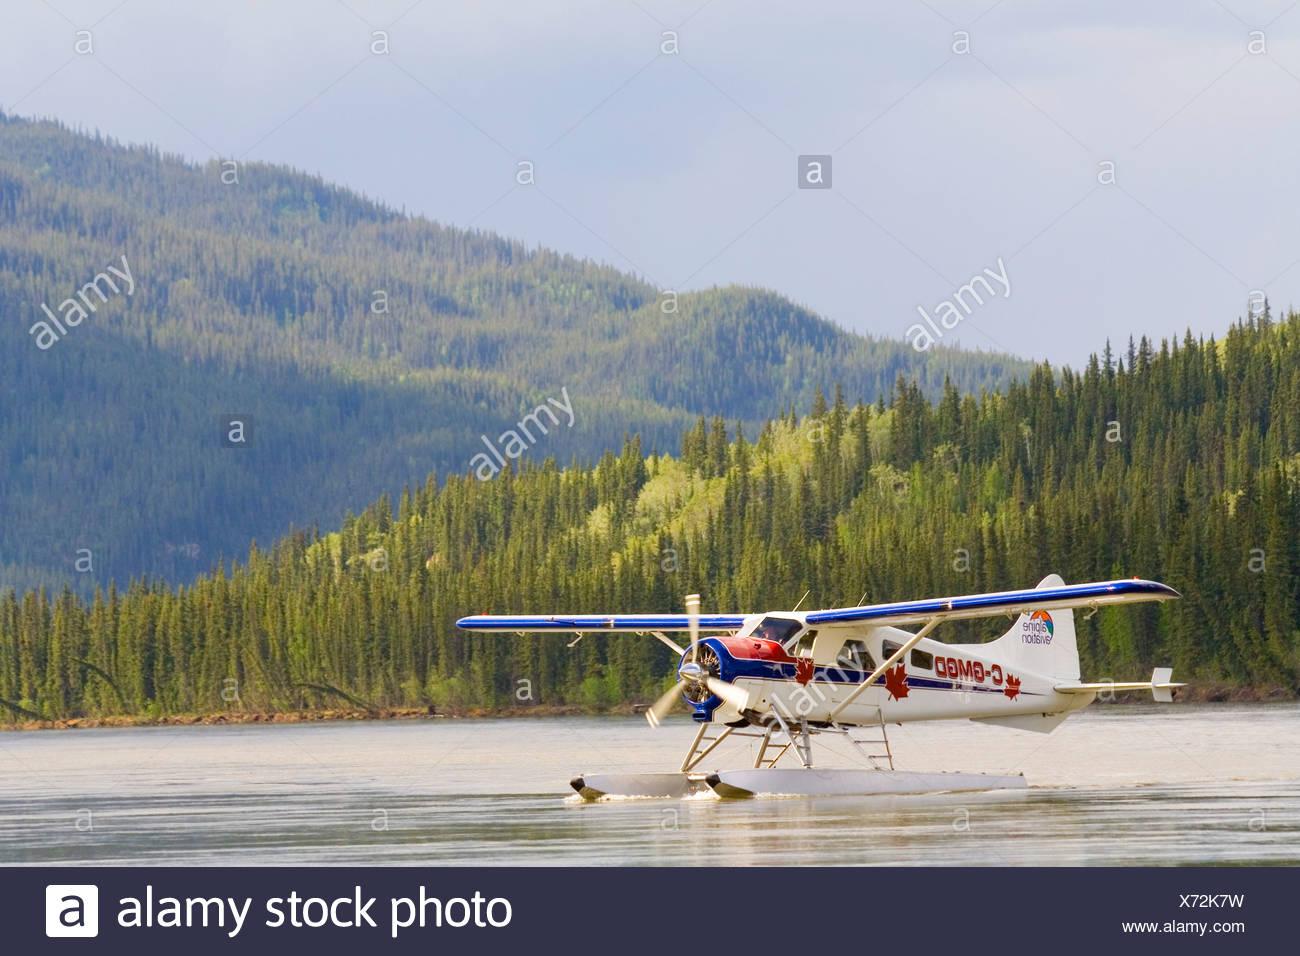 Taxiing, legendary de Havilland Canada DHC-2 Beaver, float plane, bush plane, Yukon River, Teslin River, Hootalinqua, Yukon Ter - Stock Image